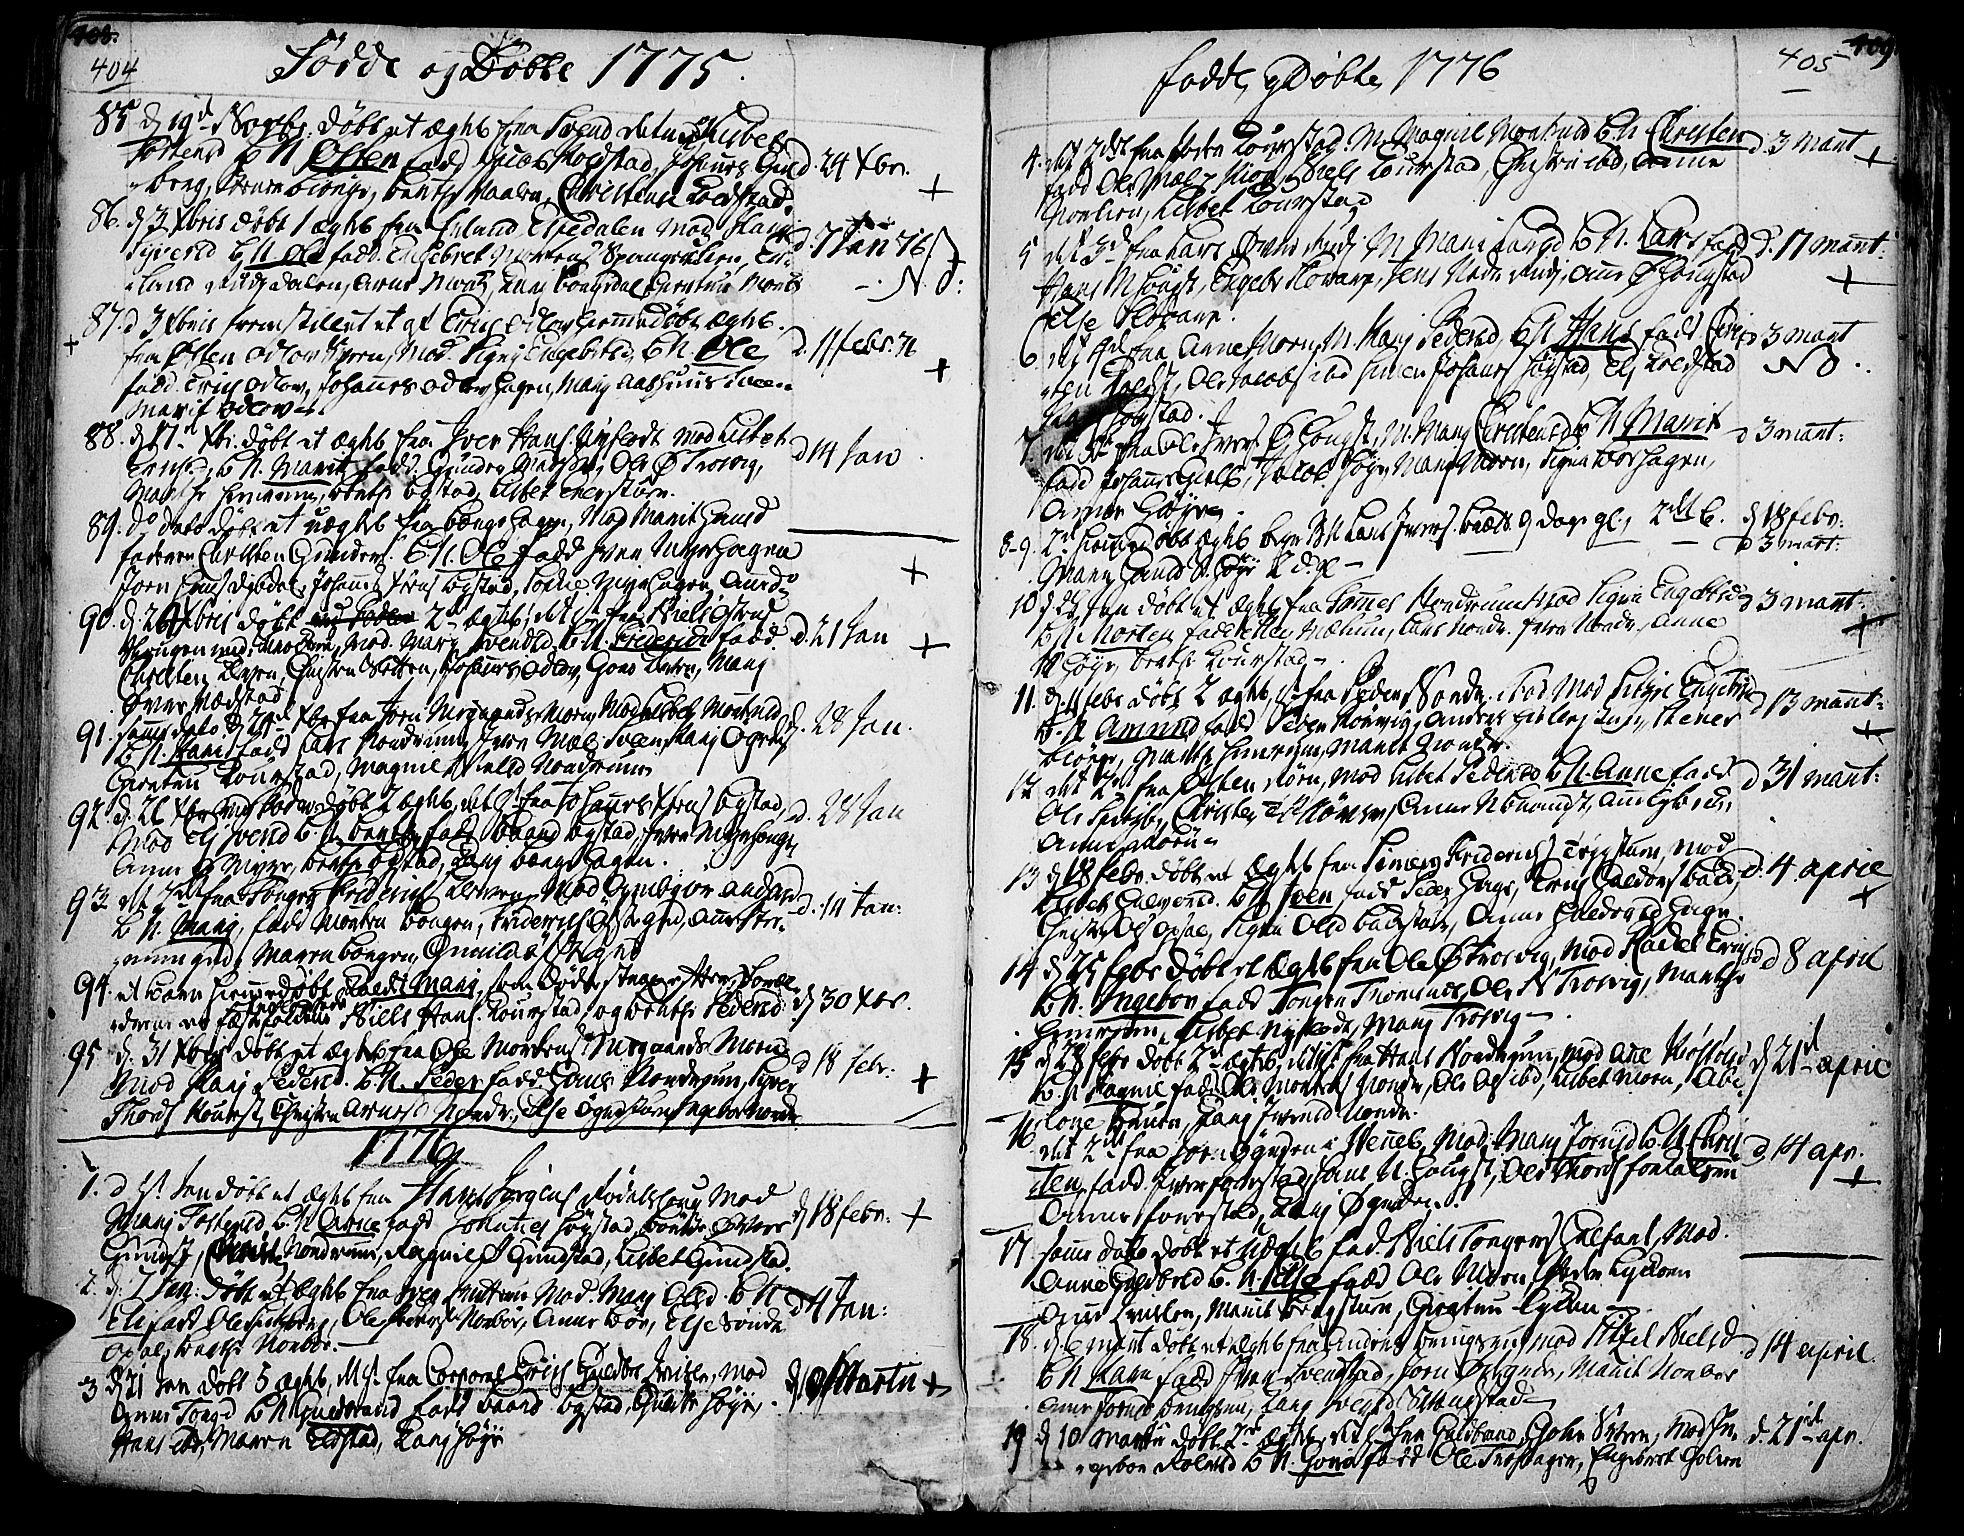 SAH, Ringebu prestekontor, Ministerialbok nr. 2, 1734-1780, s. 404-405